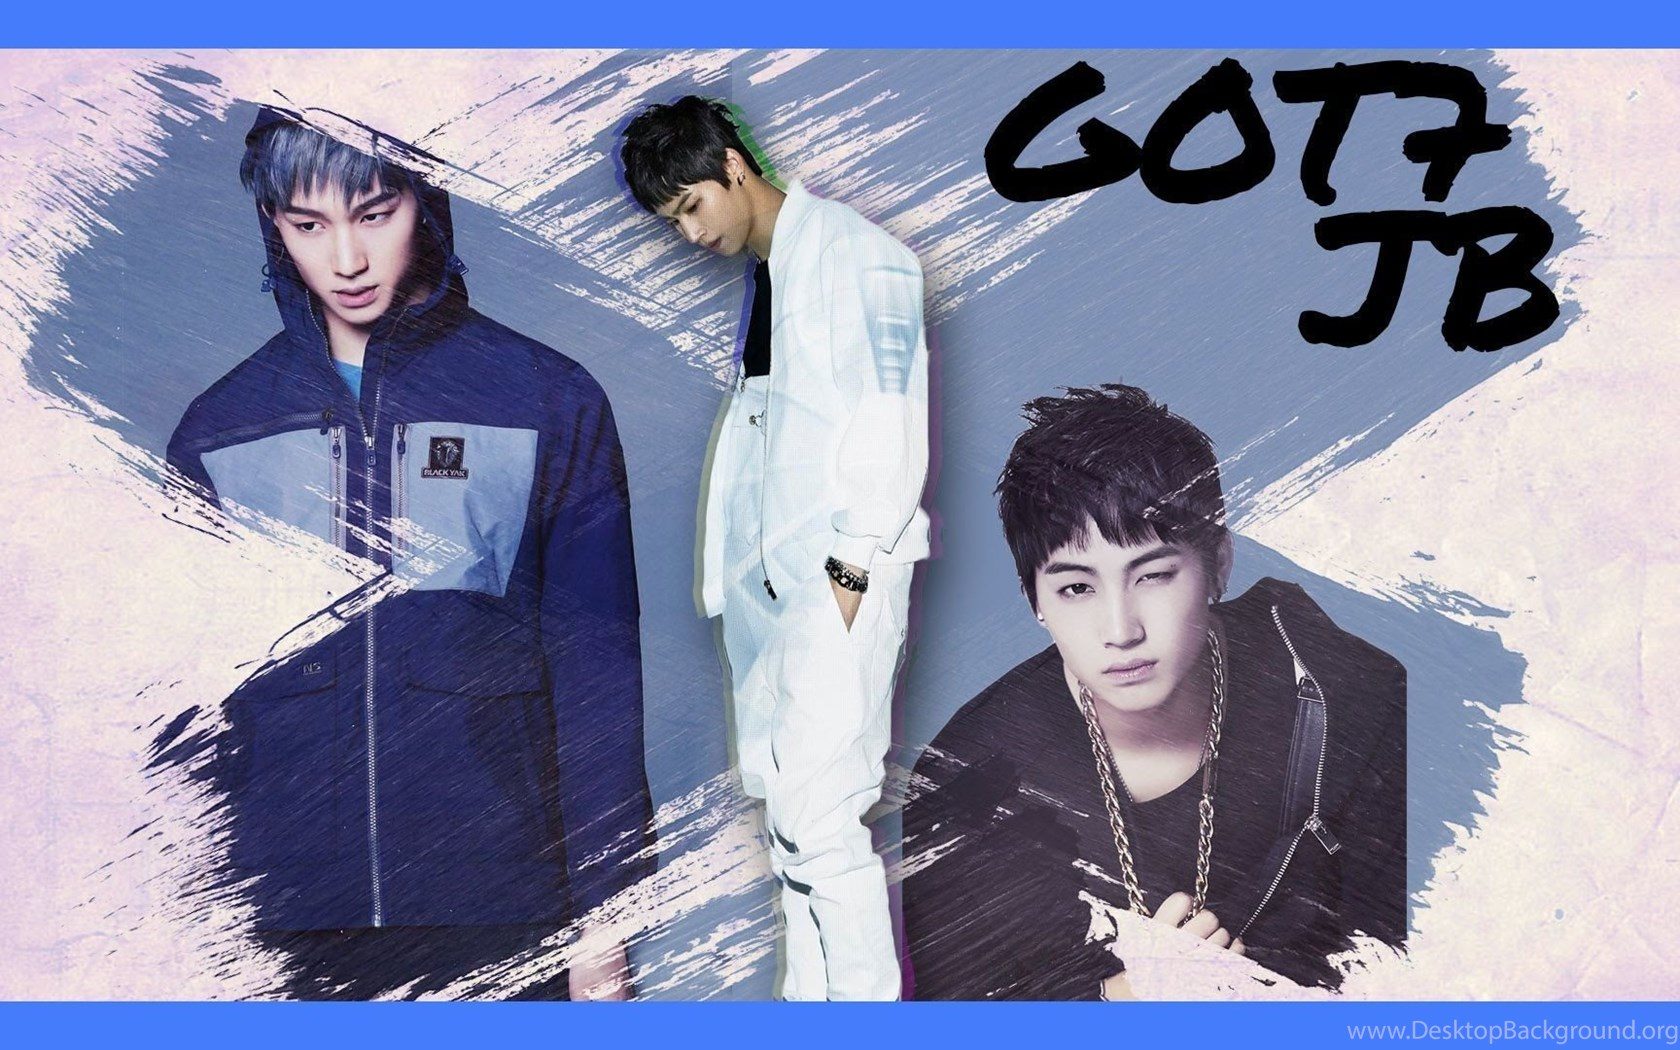 SpeedArt Kpop Edit Got7 Identity JB Im Jaebum Wallpapers